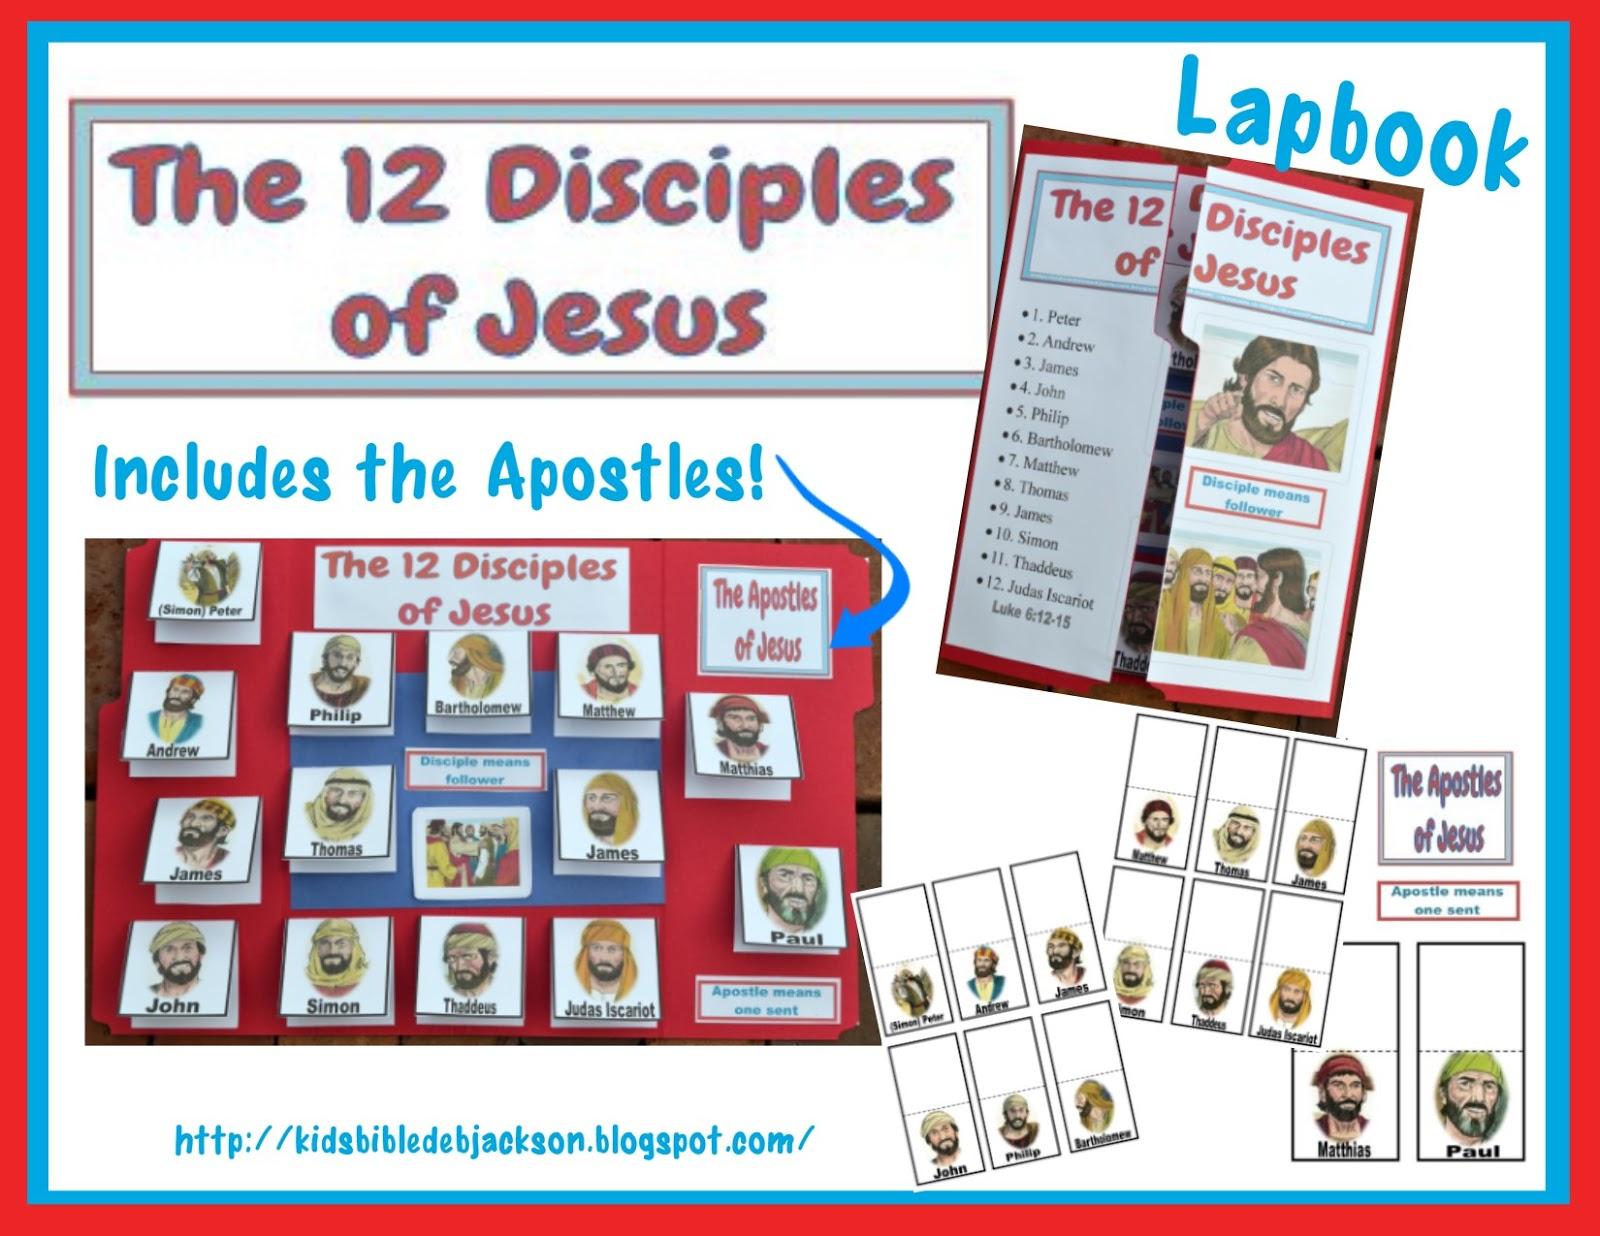 http://kidsbibledebjackson.blogspot.com/2014/07/jesus-picks-his-disciples.html